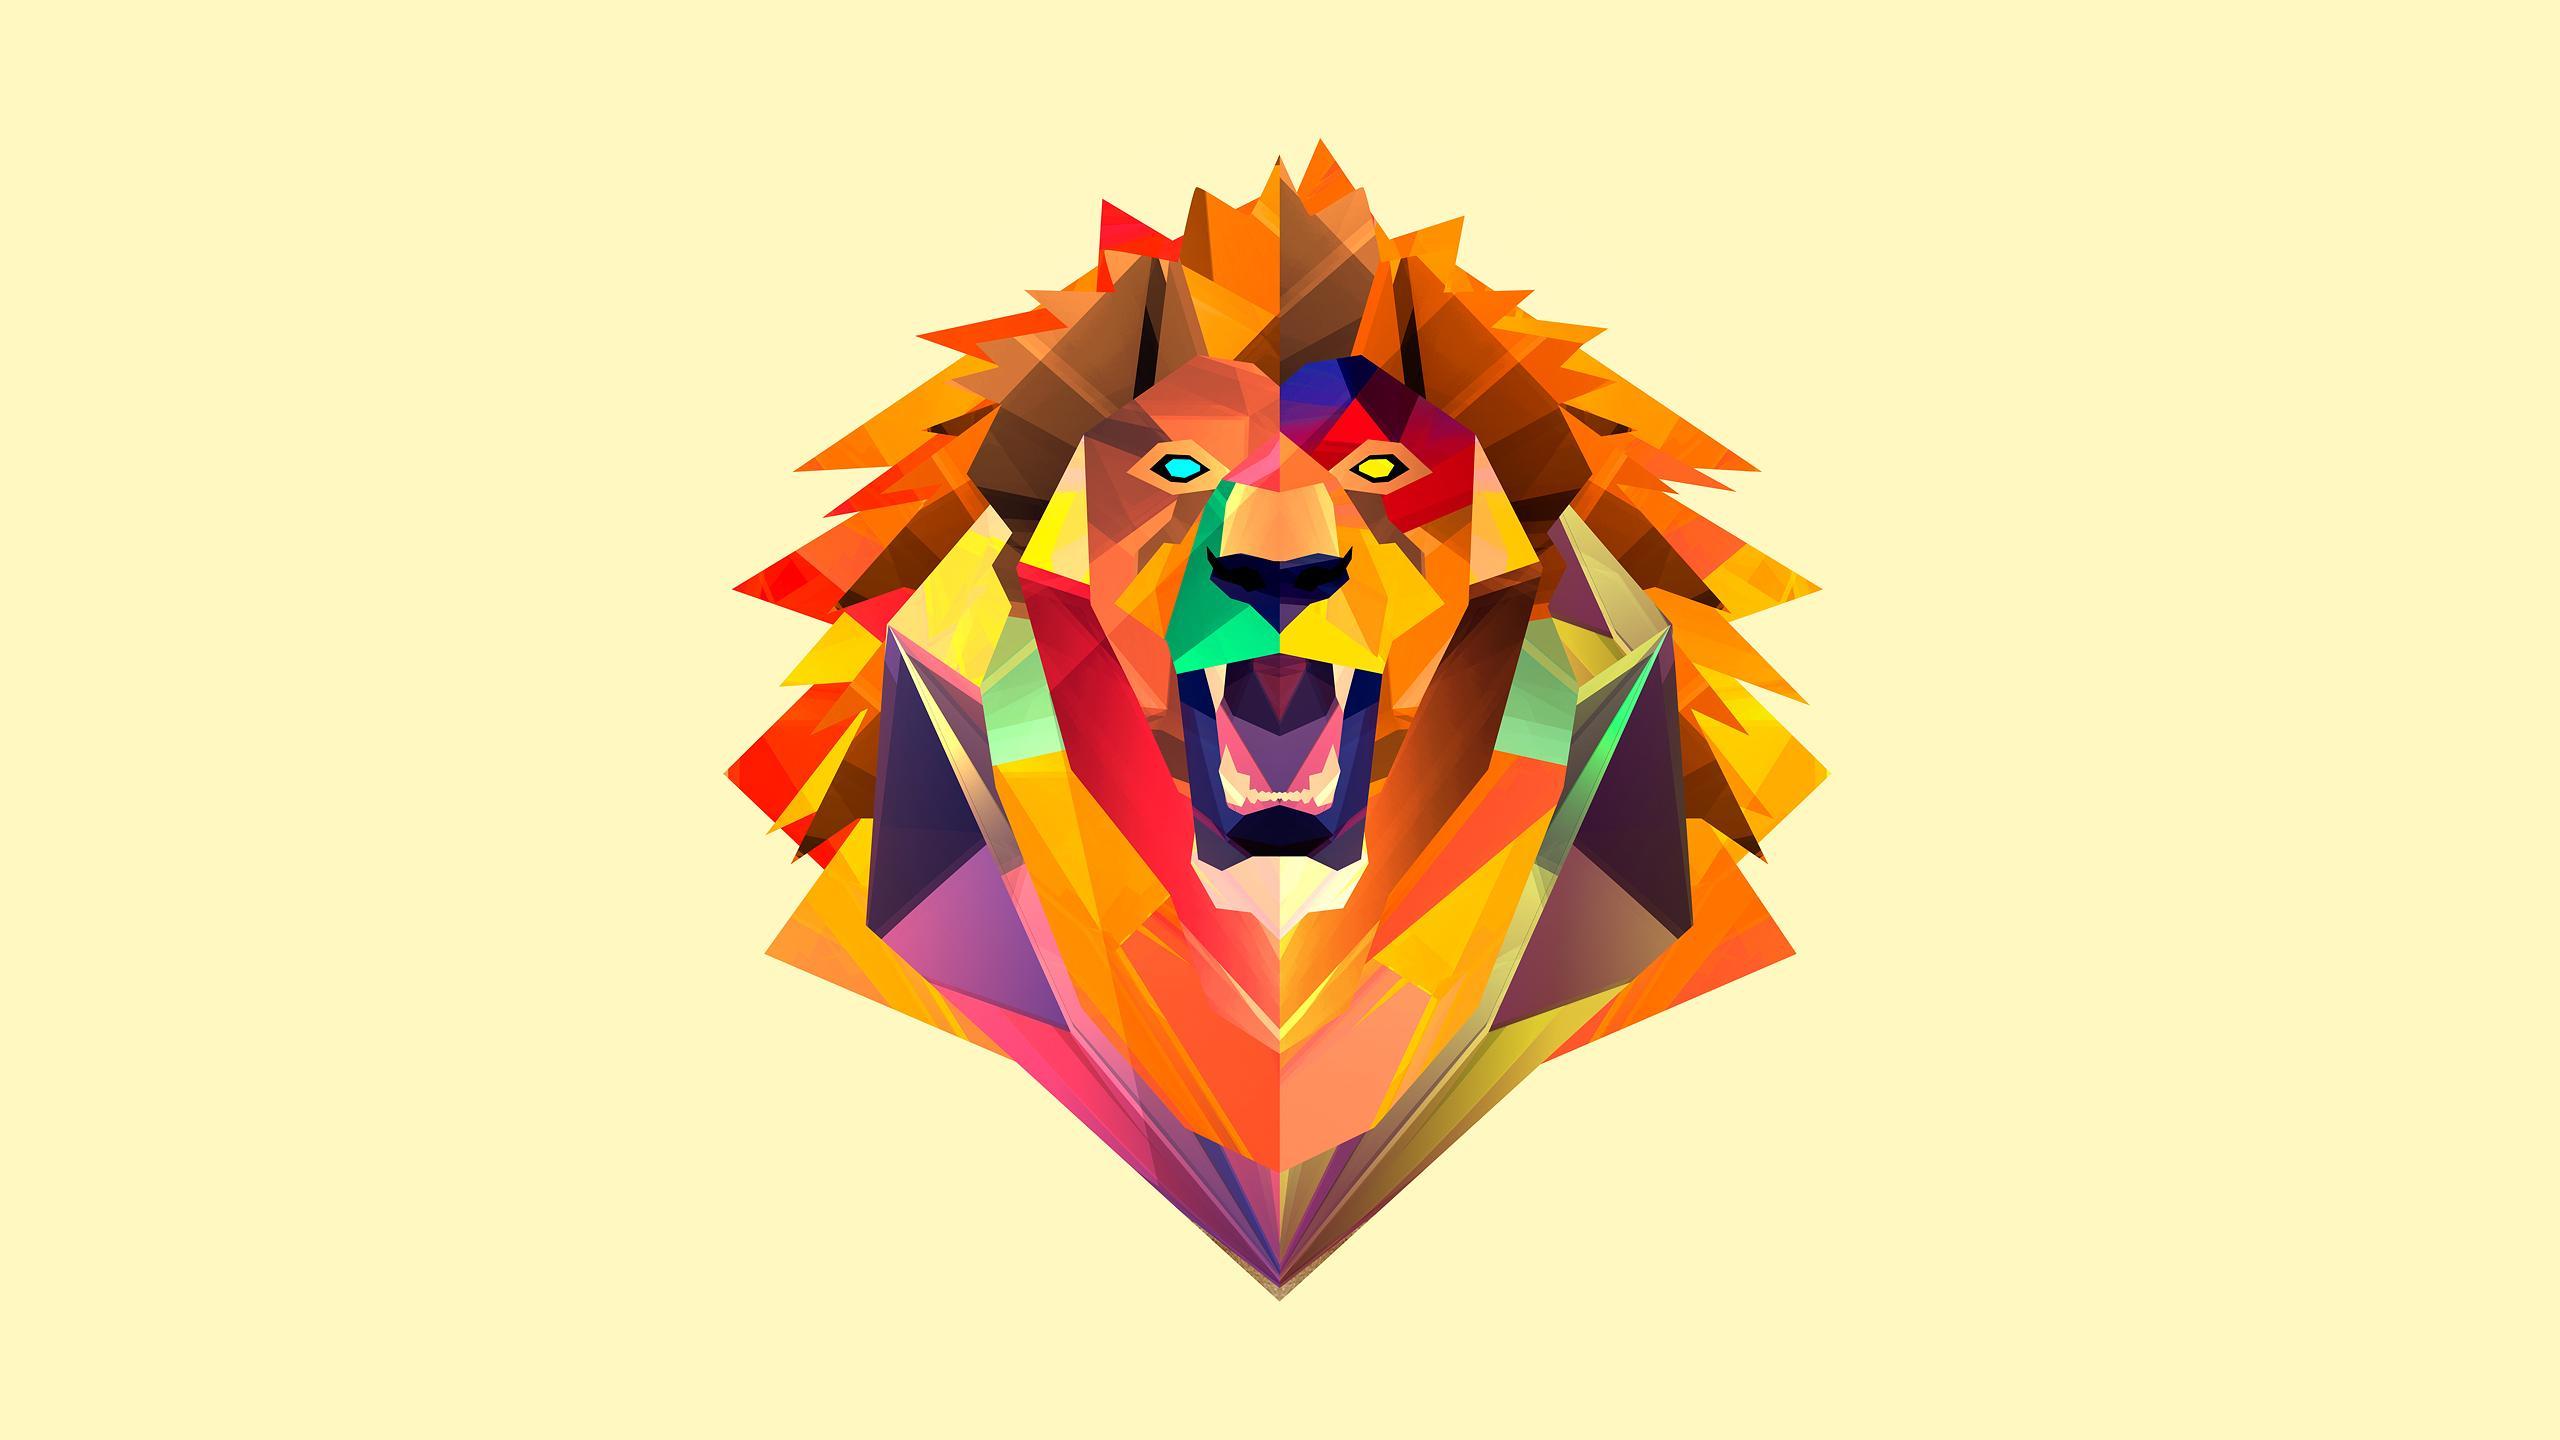 Iphone wallpaper tumblr lion - Designhumans Iphone 6 Plus Wallpaper Hipster Lions Tumblr